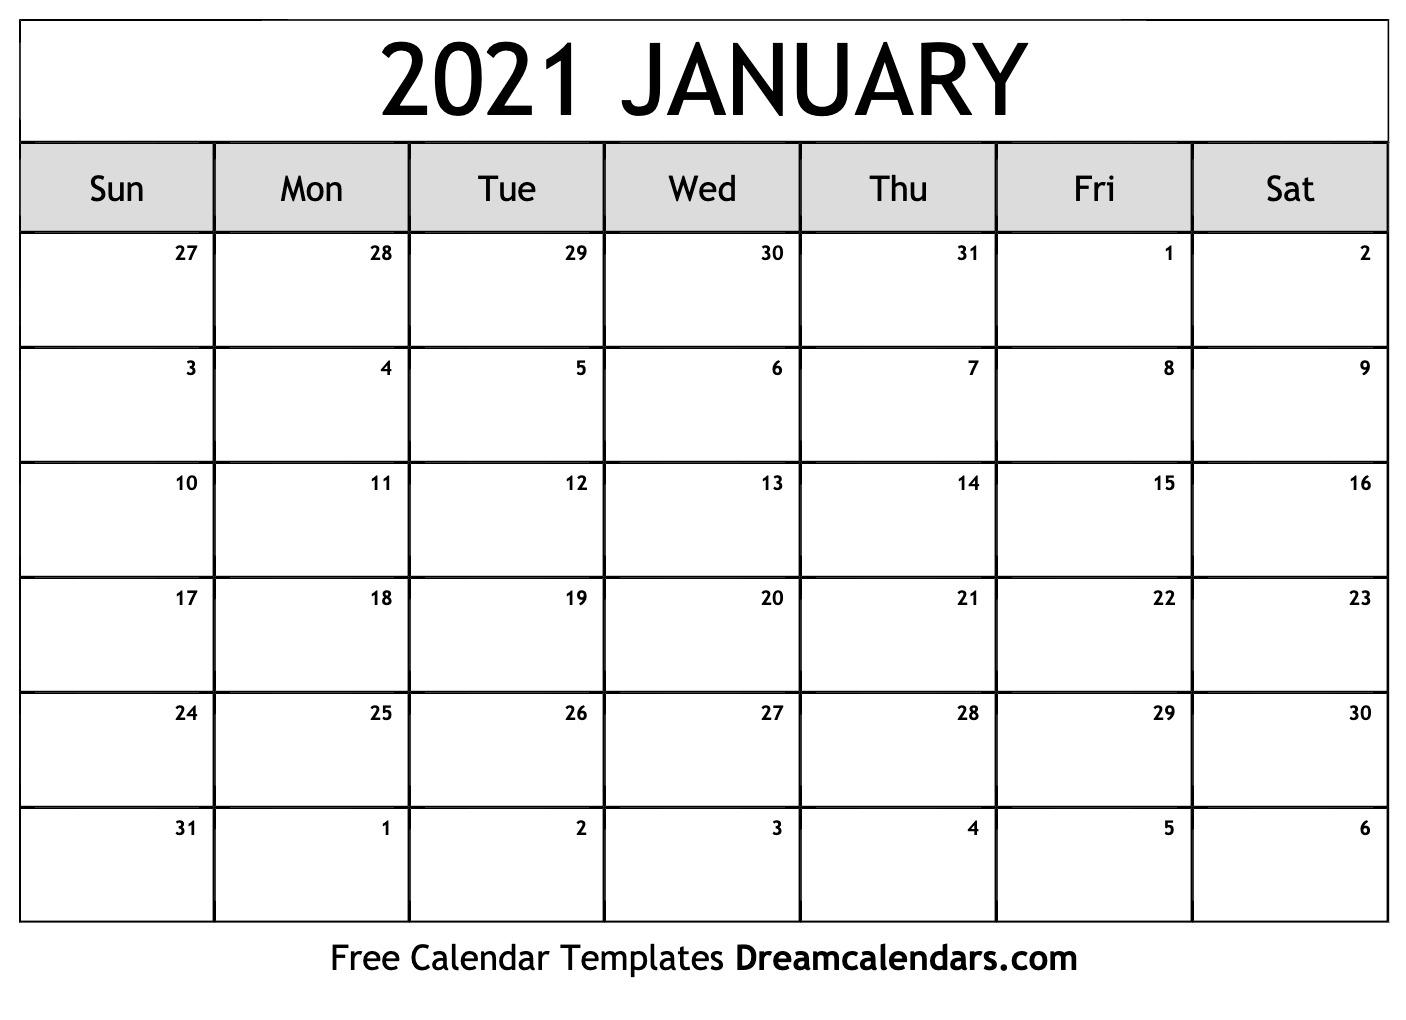 January 2021 Calendar | Free Blank Printable Templates